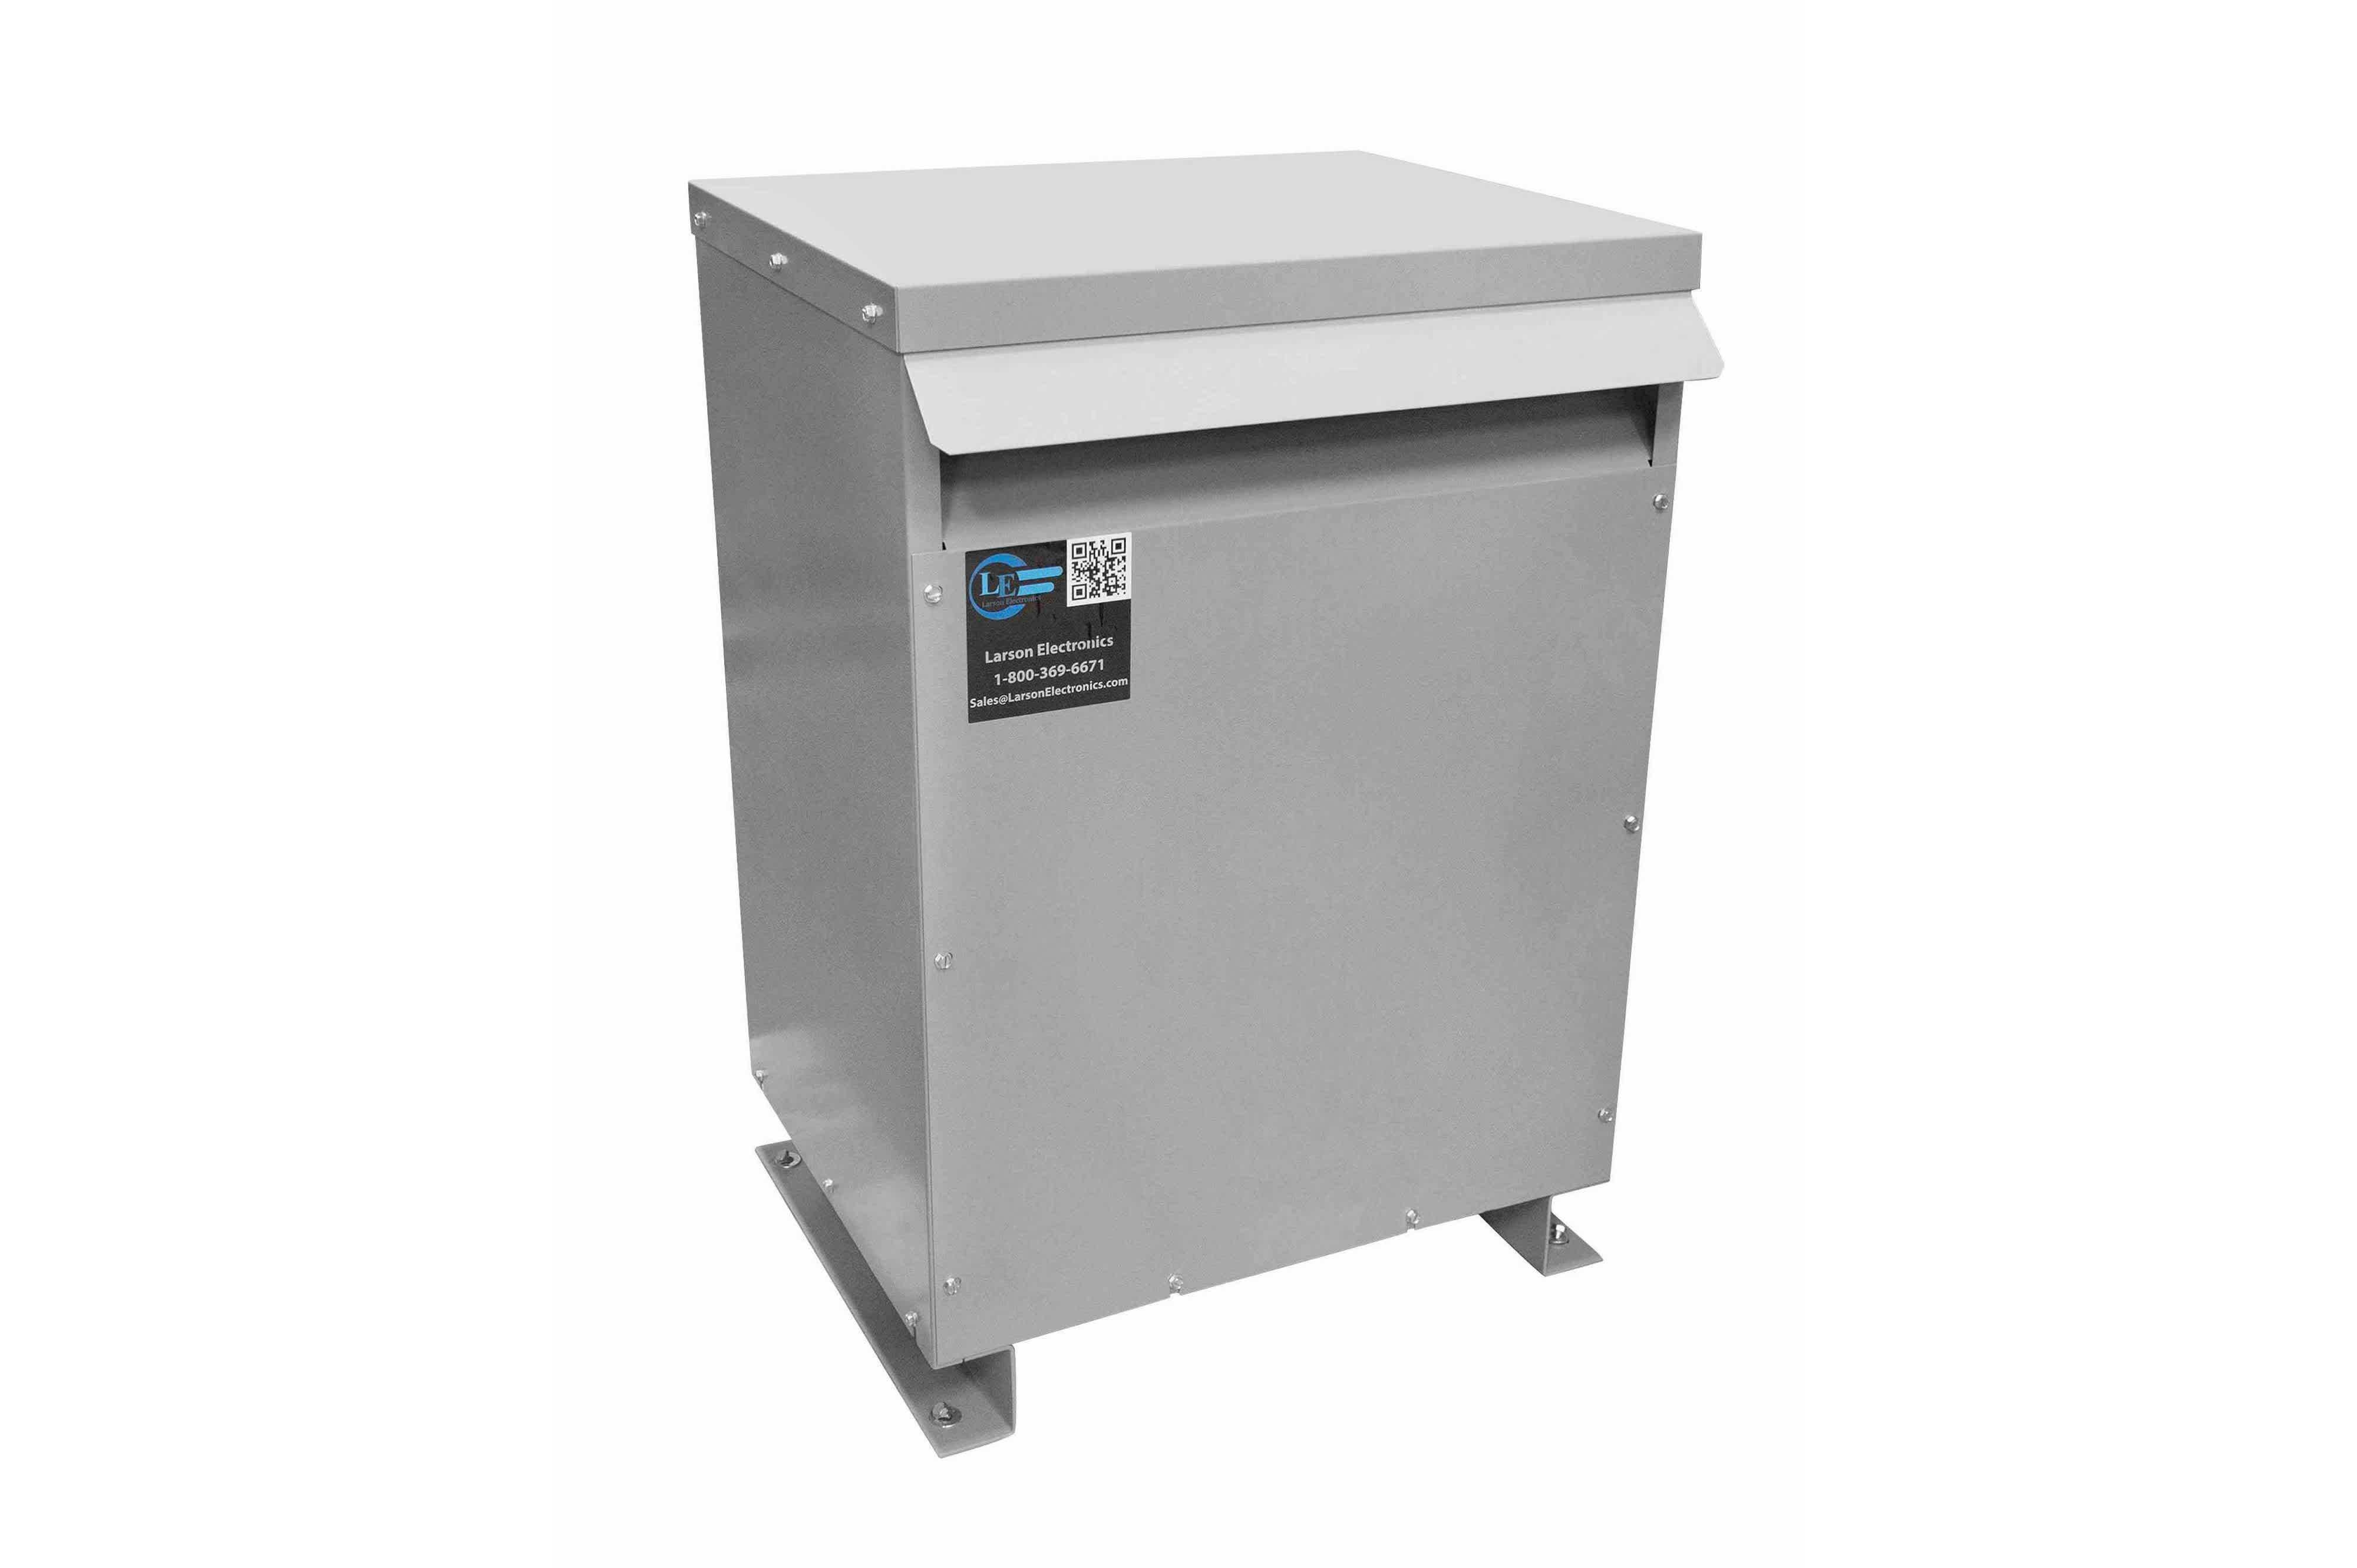 225 kVA 3PH Isolation Transformer, 600V Wye Primary, 380V Delta Secondary, N3R, Ventilated, 60 Hz